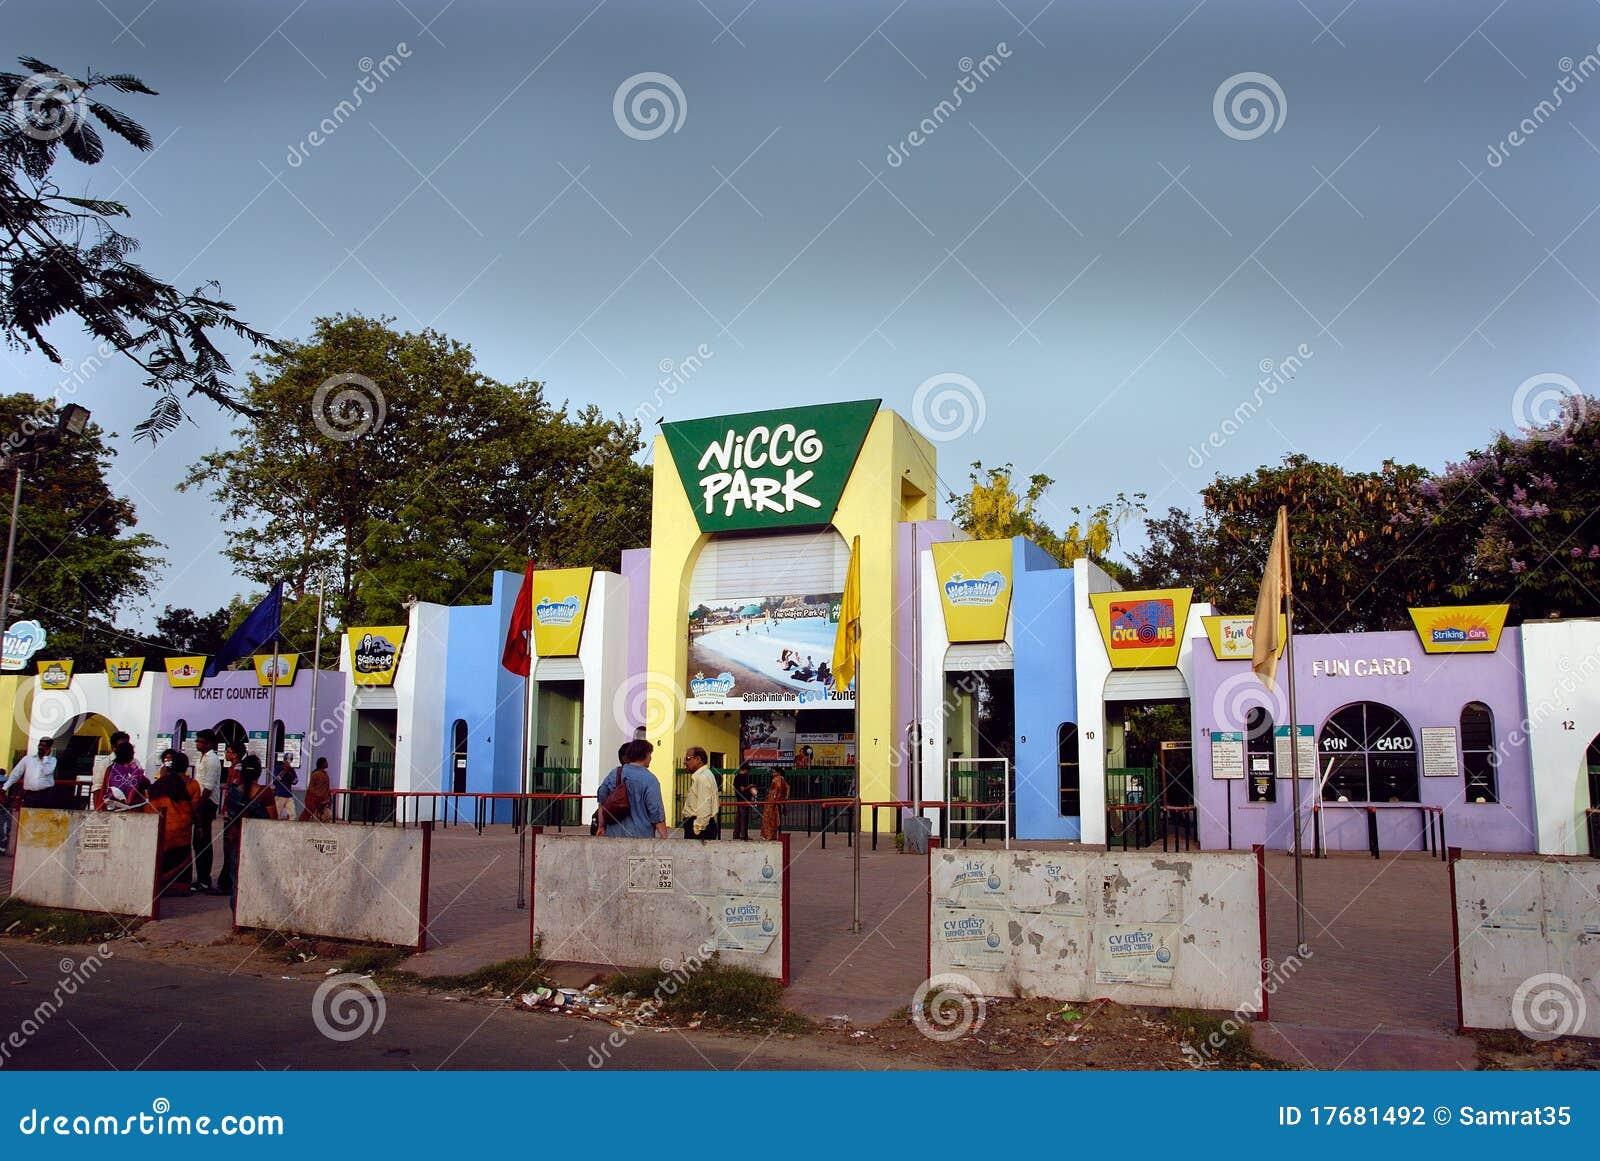 Ind kolkata nicco park